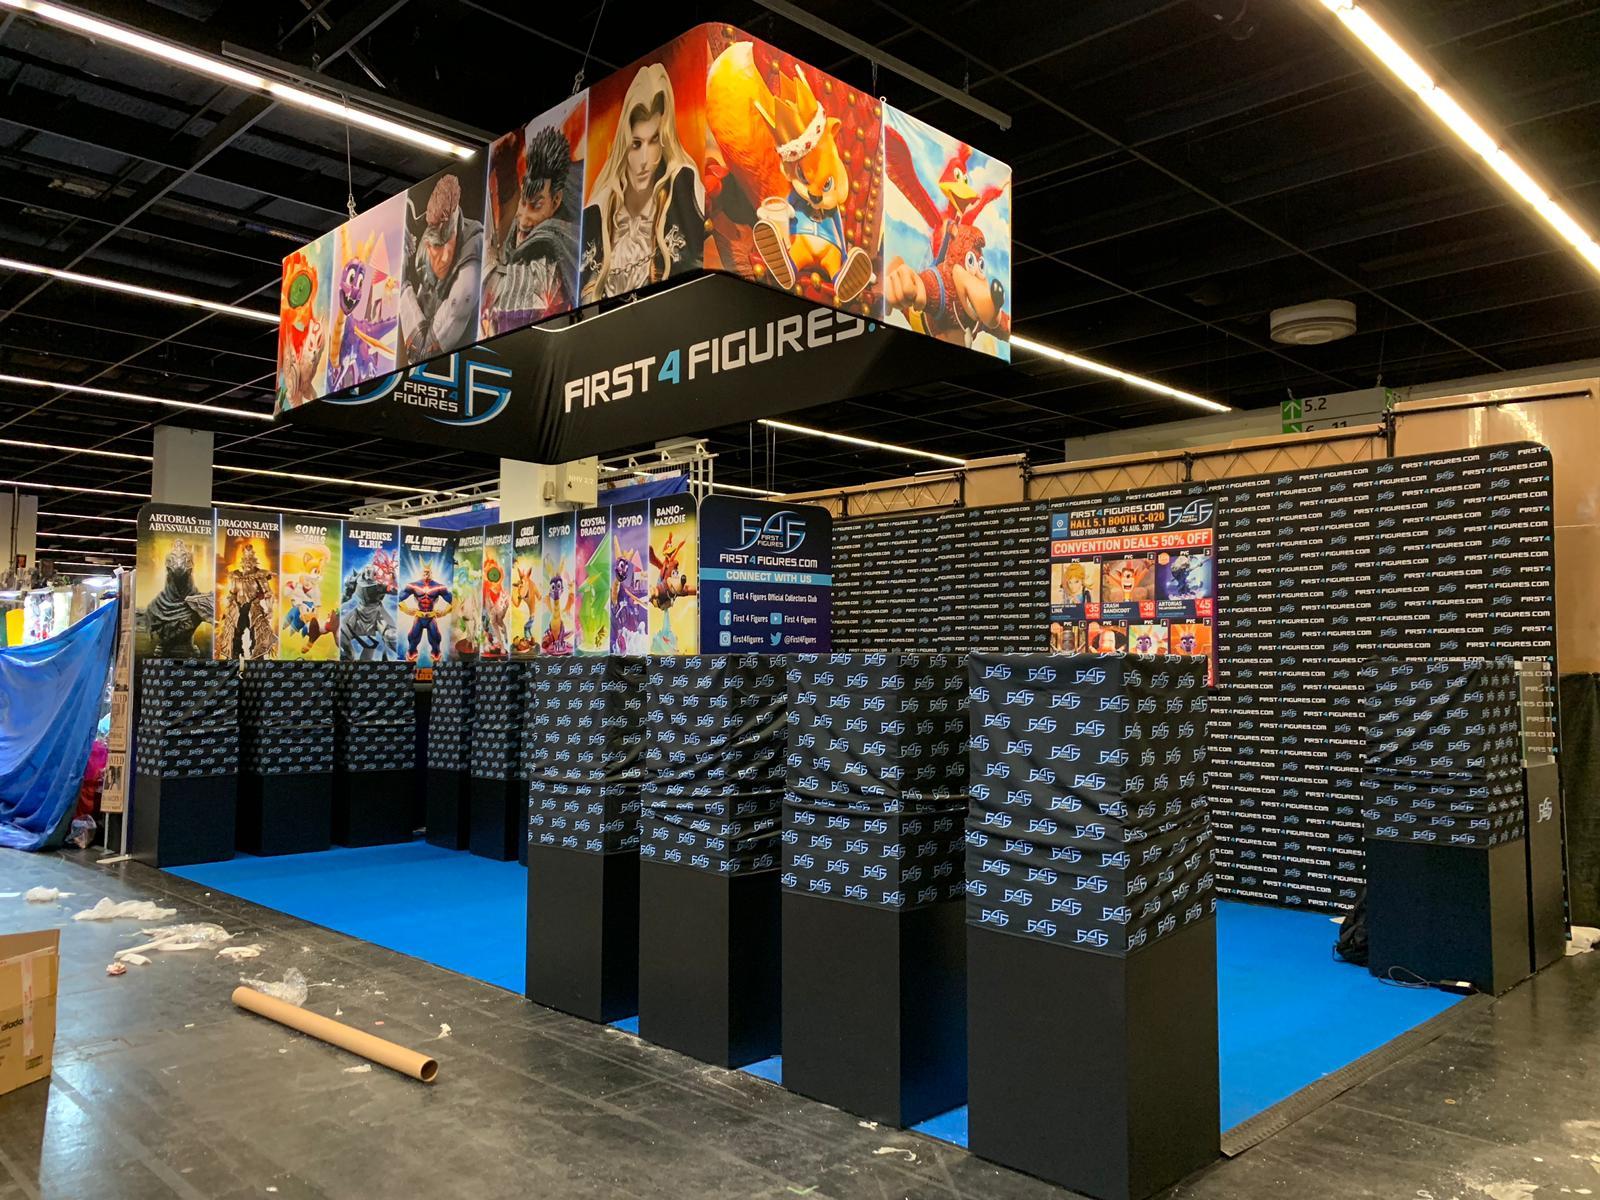 First 4 Figures booth @ Gamescom 2019